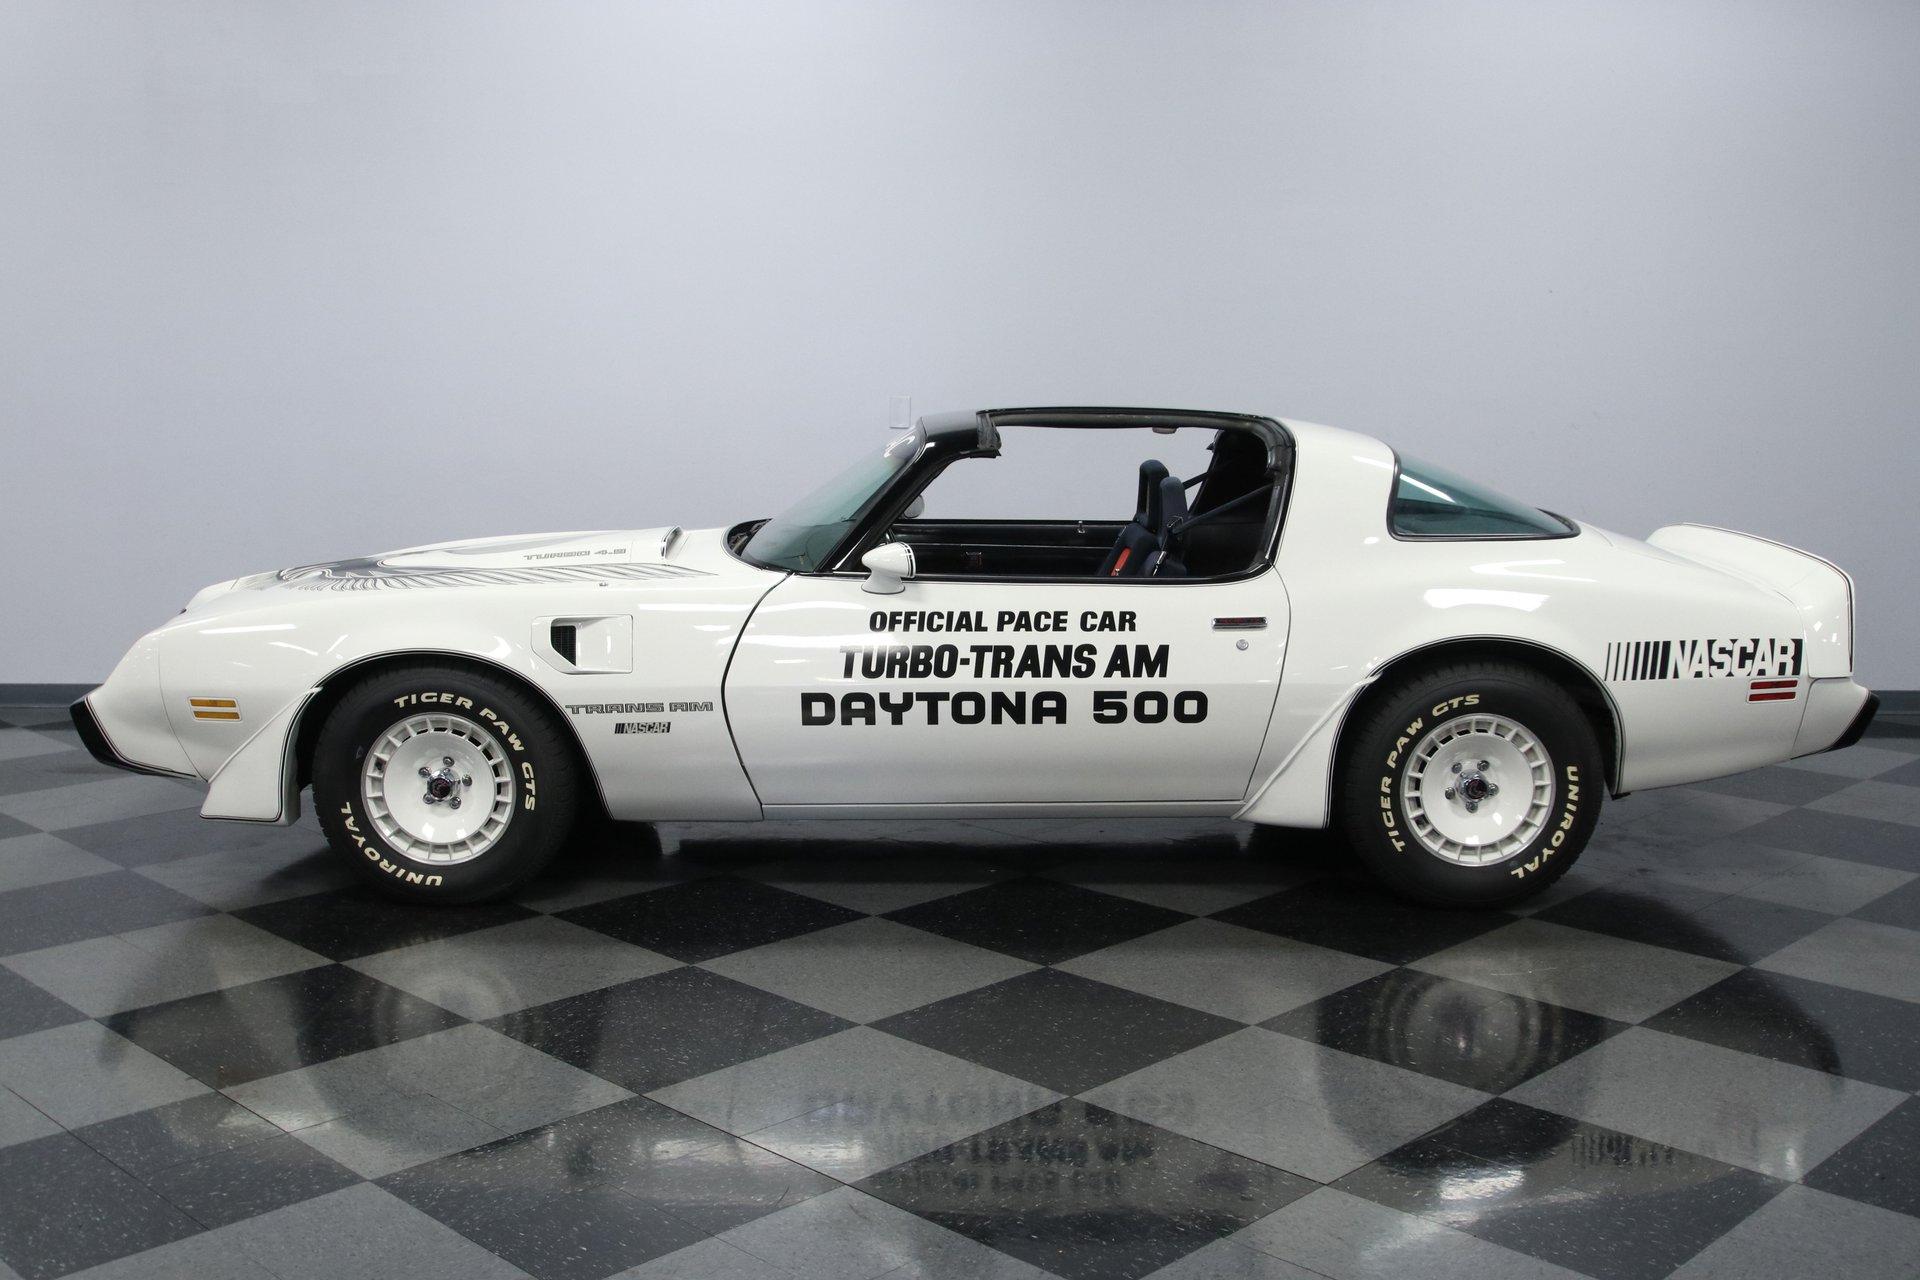 1981 pontiac firebird trans am turbo pace car